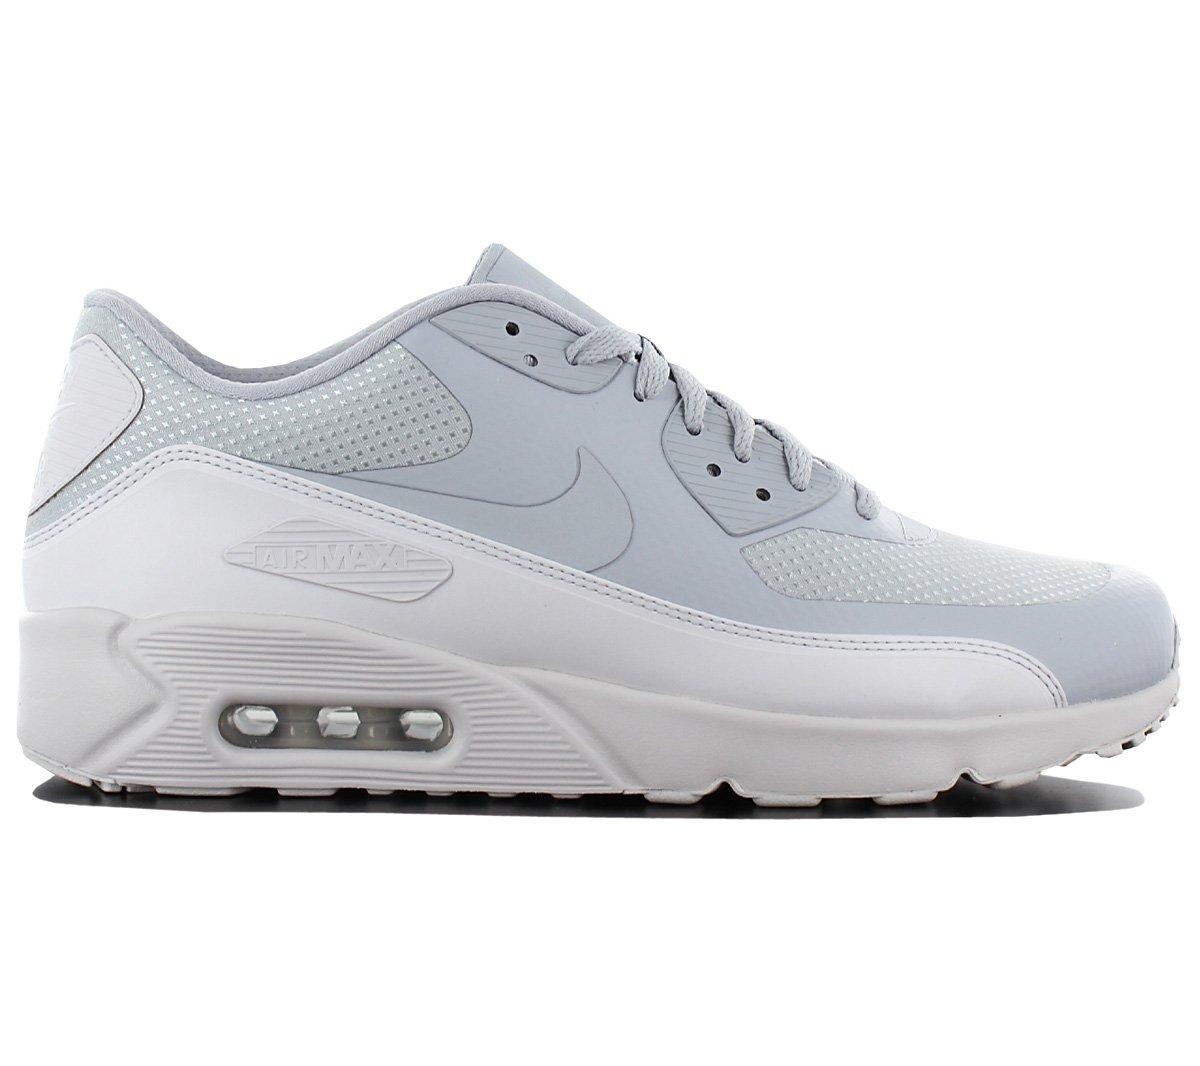 Nike Air Max 90 Ultra 2.0 Essential 875695-017 Herren Schuhe Sneaker Turnschuhe Grau-Weiszlig; Top  44 EU|Grau (Grau-grau)